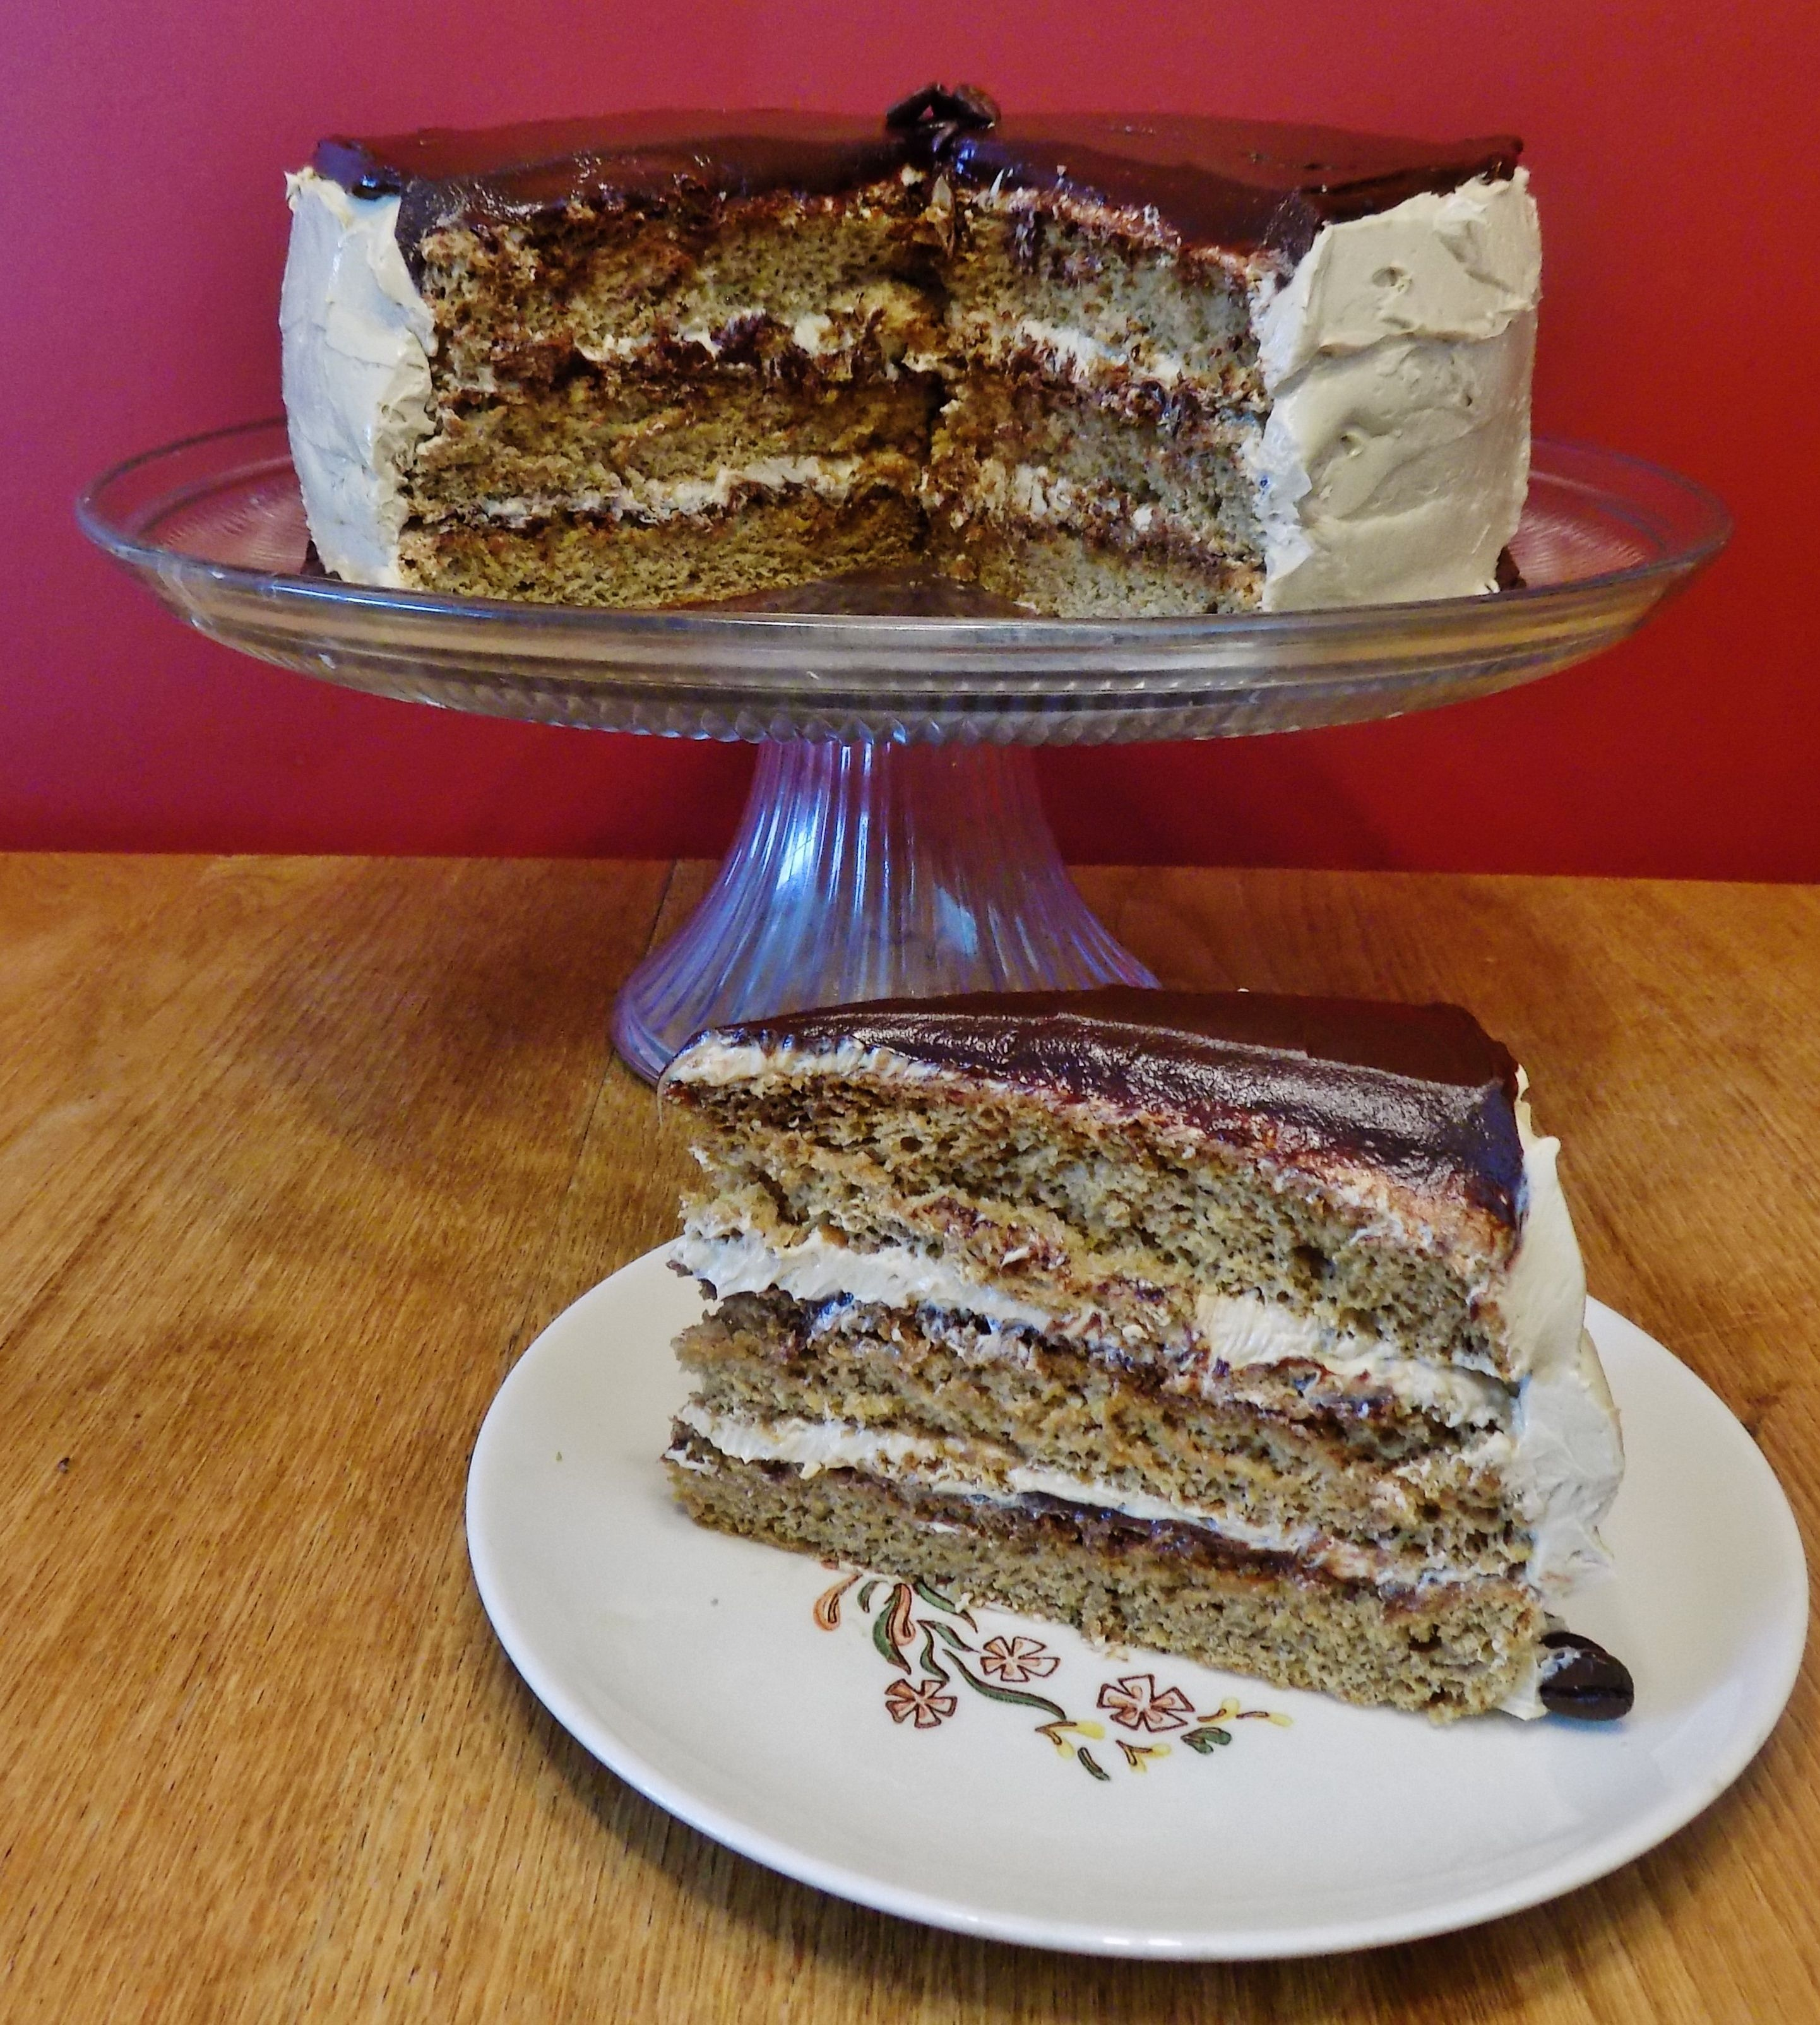 Kahlua Coffee Opera Cake FatFridaysForever (With images